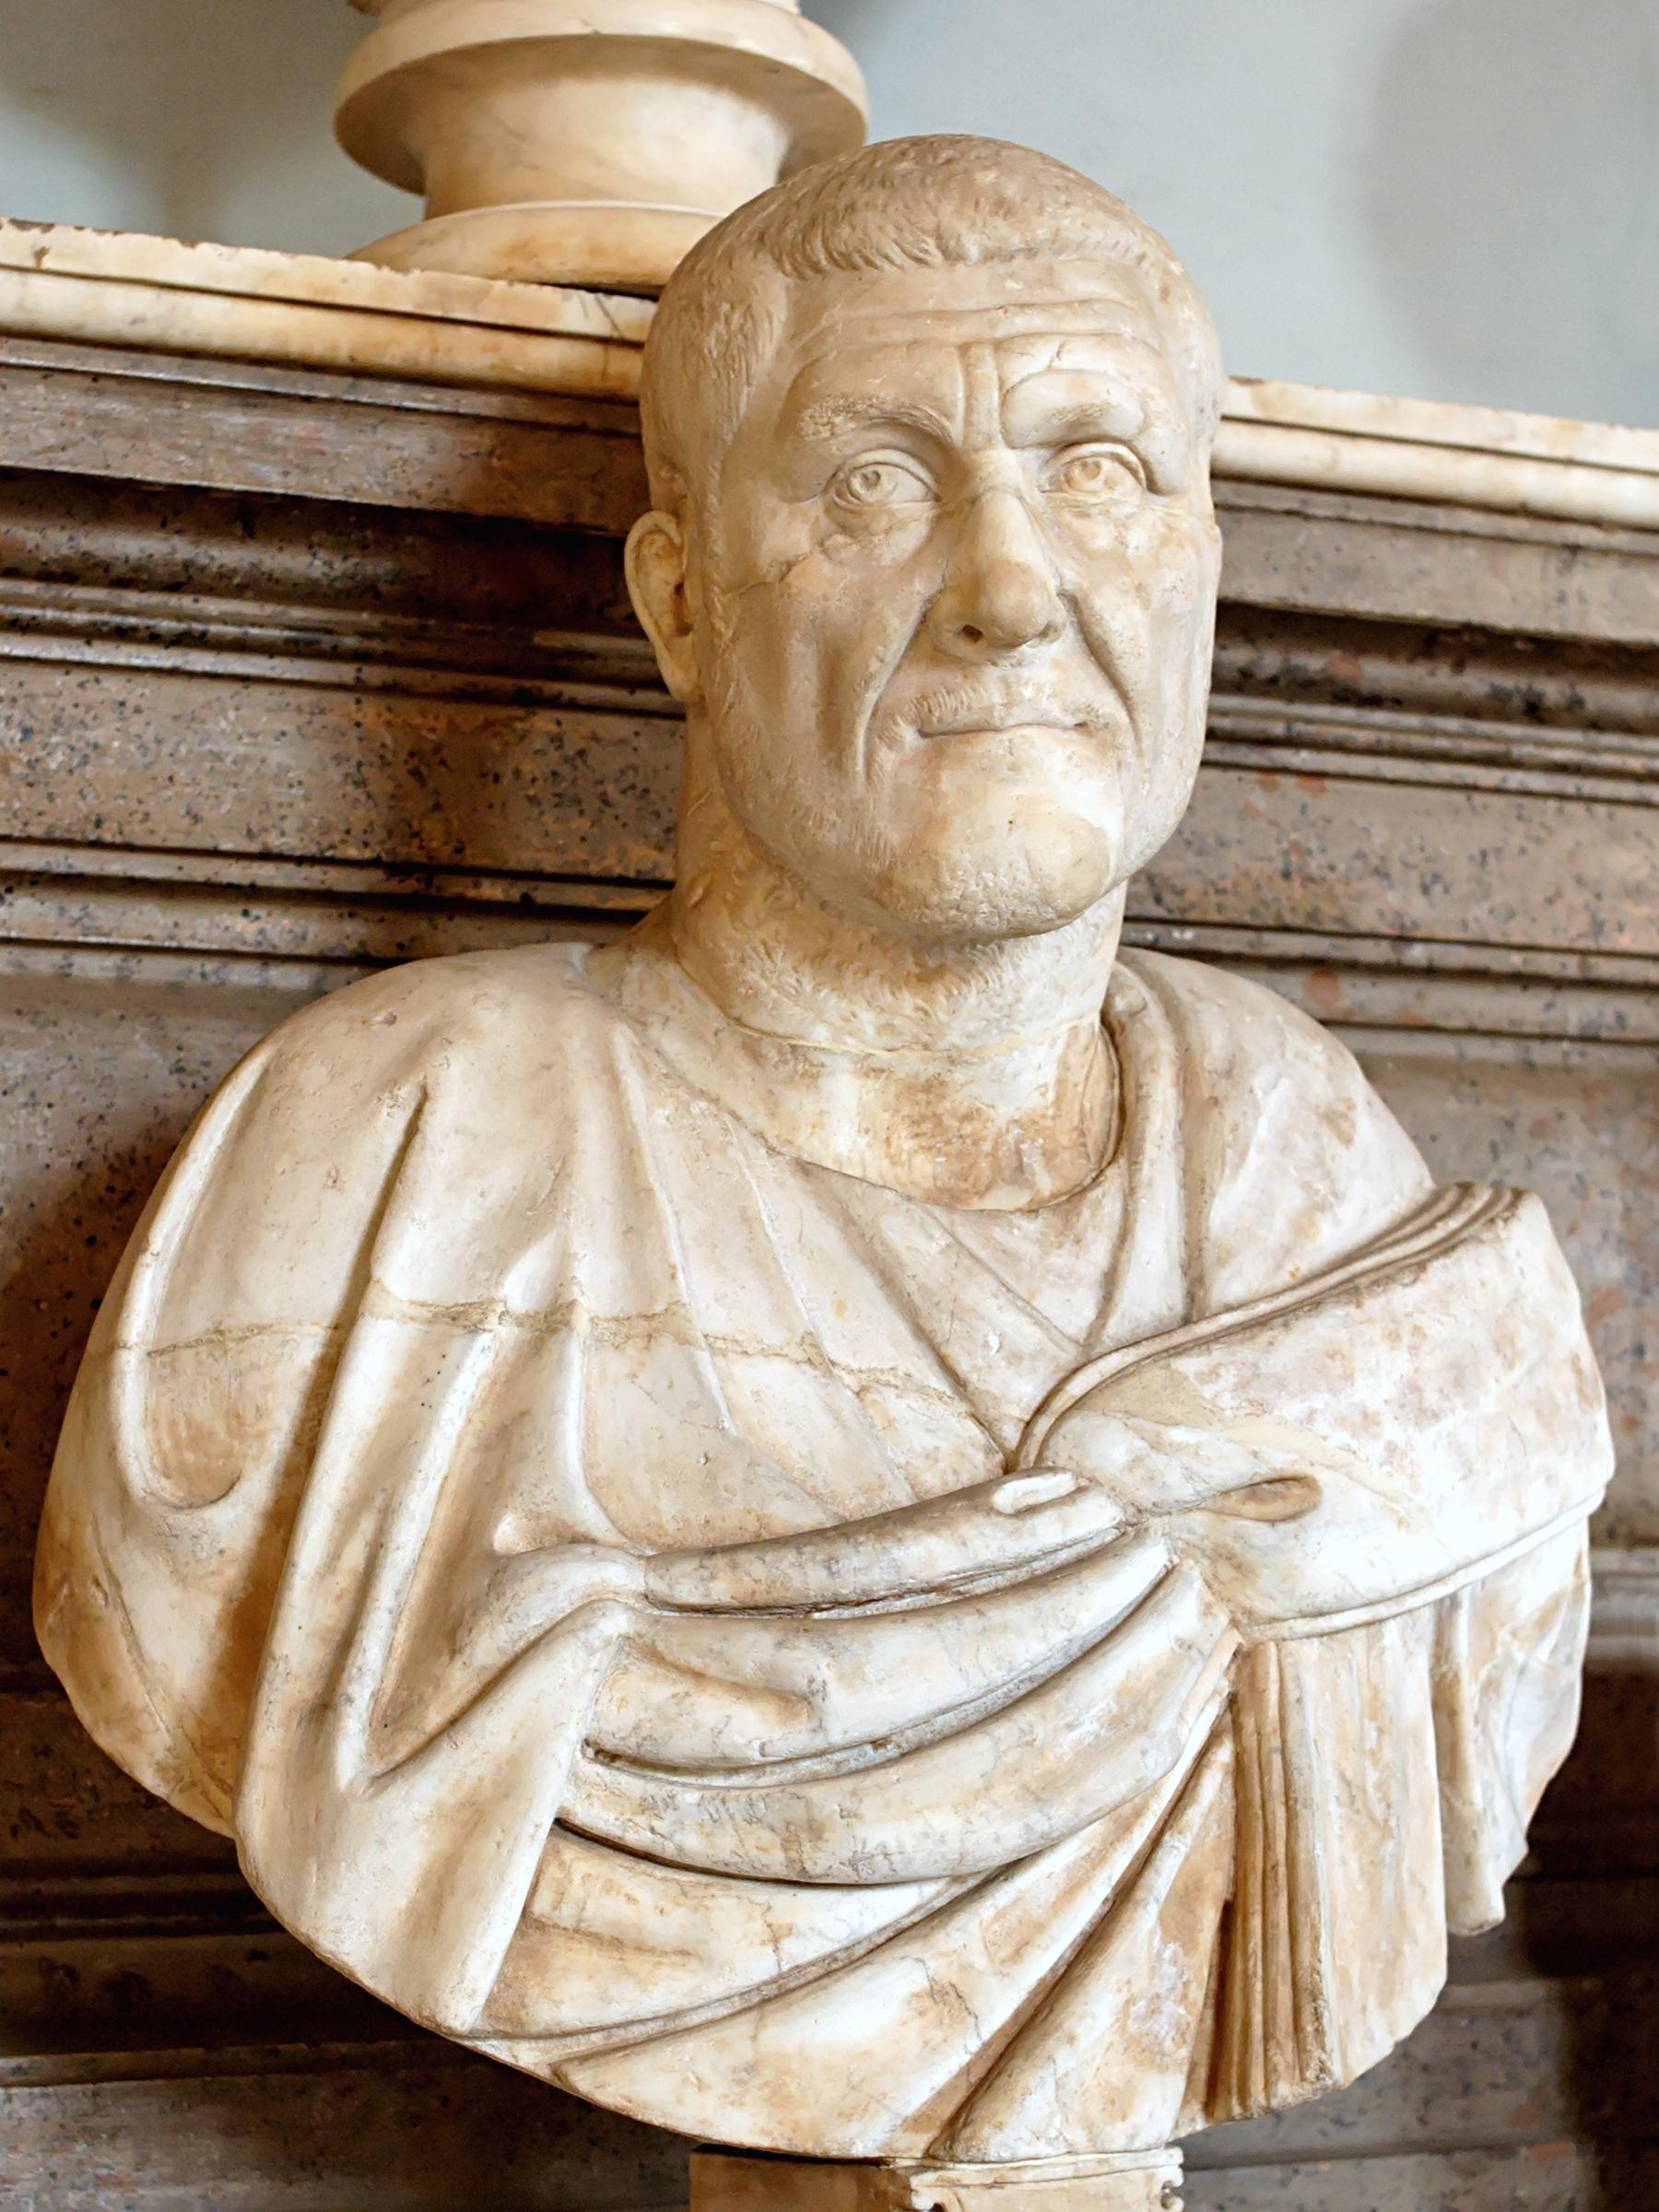 https://i1.wp.com/upload.wikimedia.org/wikipedia/commons/4/4f/Maximinus_Thrax_Musei_Capitolini_MC473.jpg